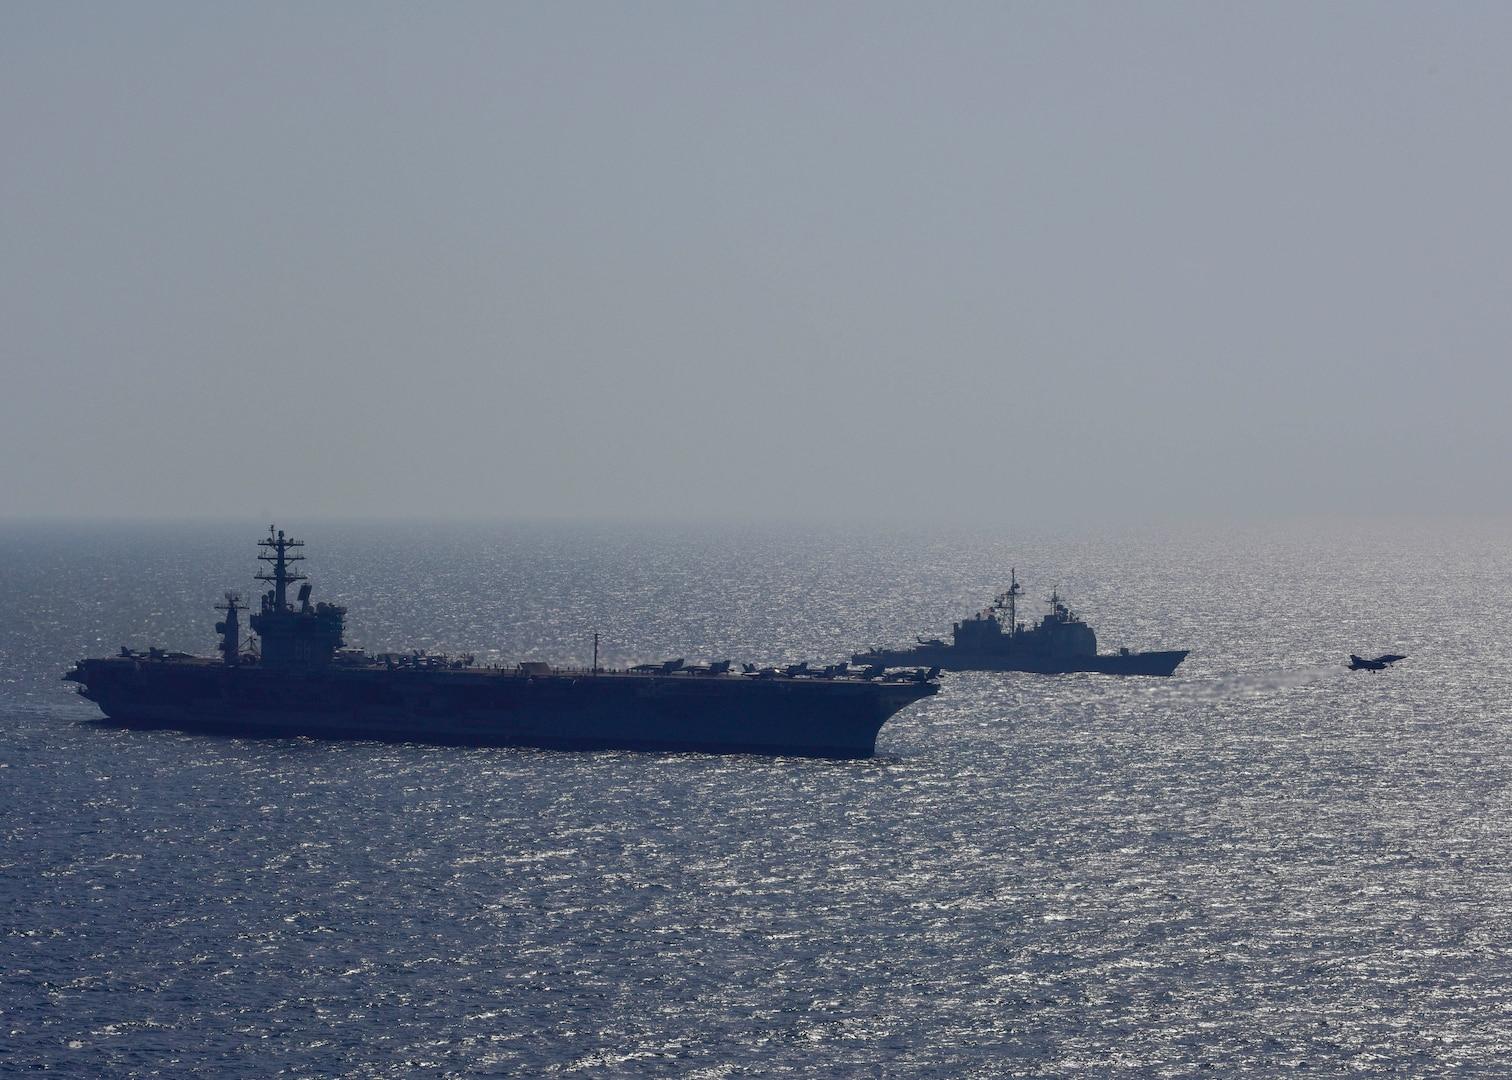 Nimitz Carrier Strike Group Enters 7th Fleet